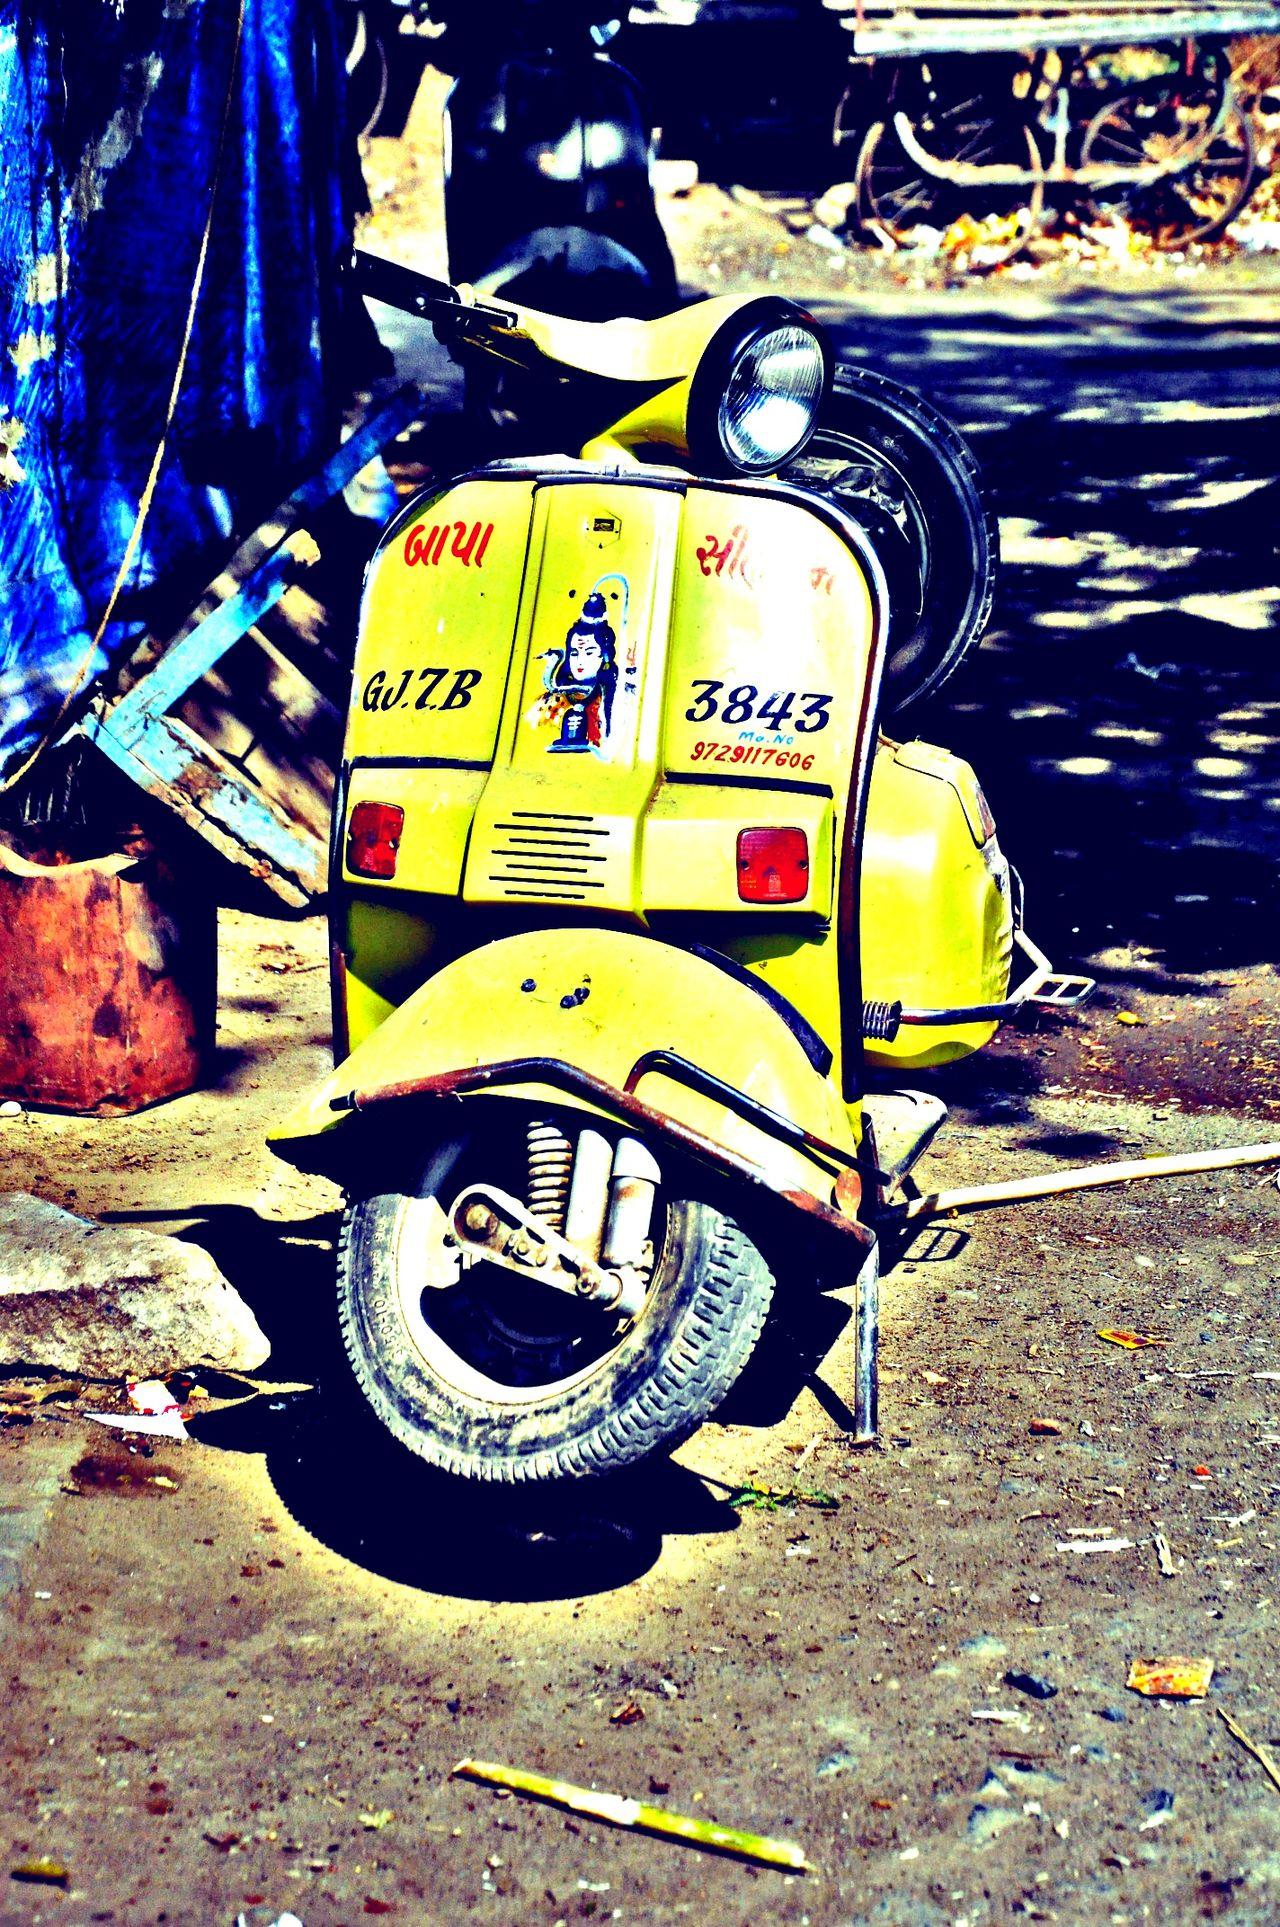 Transportation Mode Of Transport Outdoors Messy Shadowandhighlight Edited Schooter Vihicle The Great Outdoors - 2016 EyeEm Awards Vhshah Yellow Color Poorpeople Modern Vintage Modern Vintage Photography Gujarat Gujarati People Vehicle Vehicle Photography